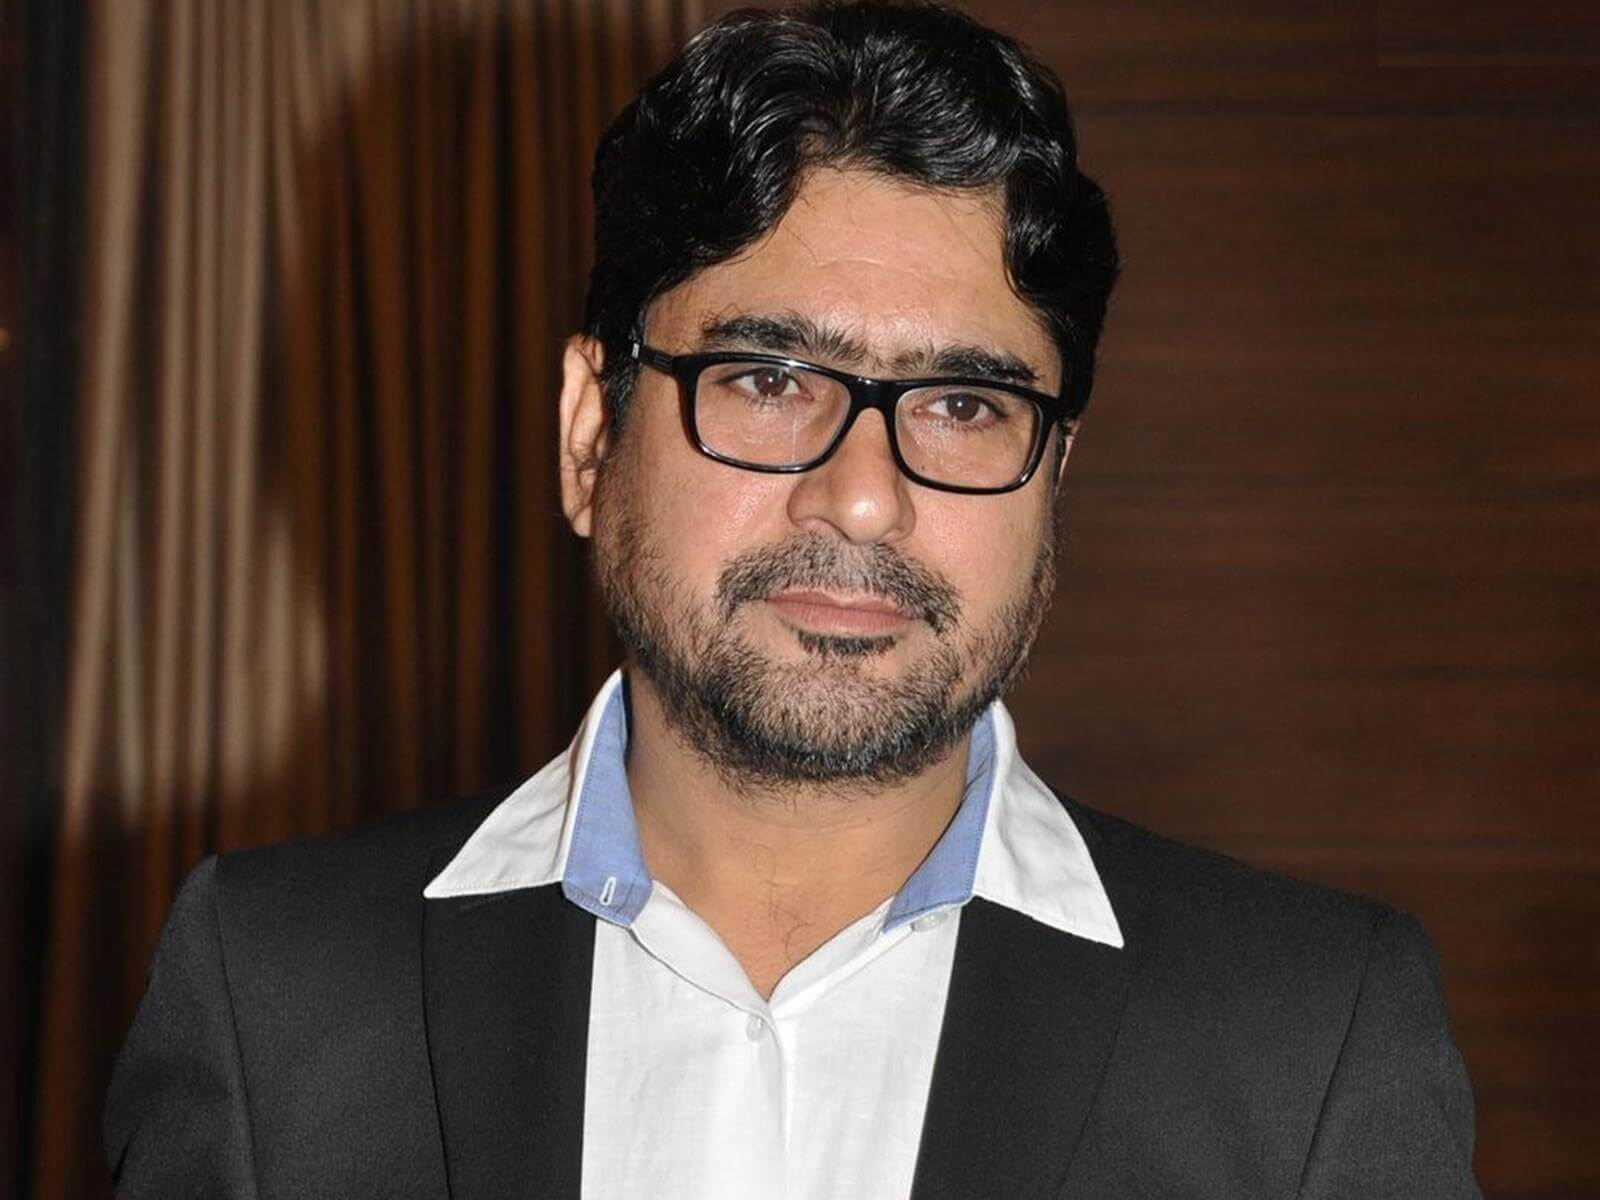 Yashpal Sharma (Actor) Wiki, Biography, Age, Movies, Images - News Bugz